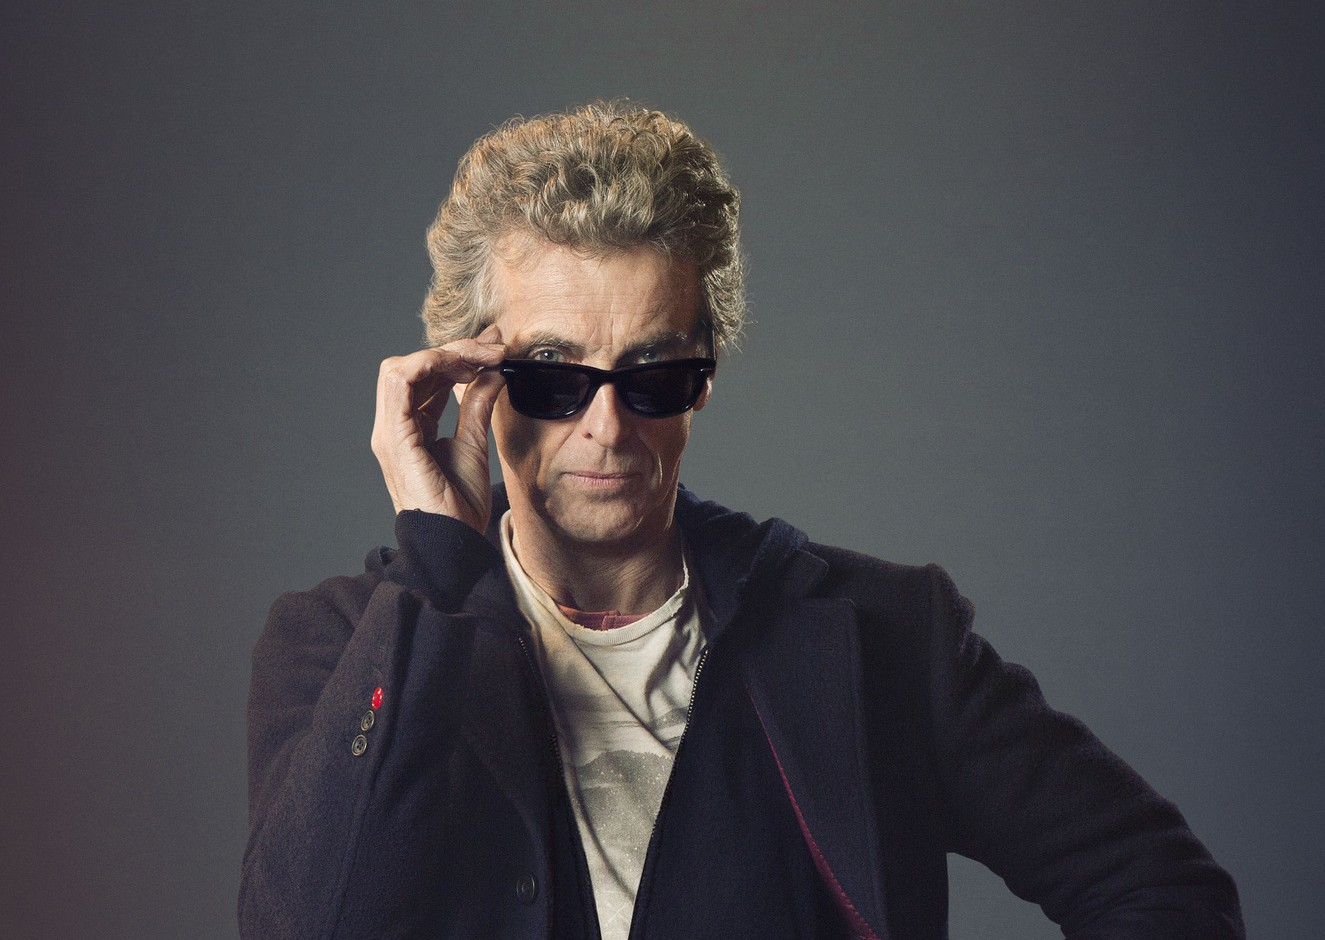 Doctor Who boss Steven Moffat talks Star Trek crossover, Peter Jackson and changing the TARDIS